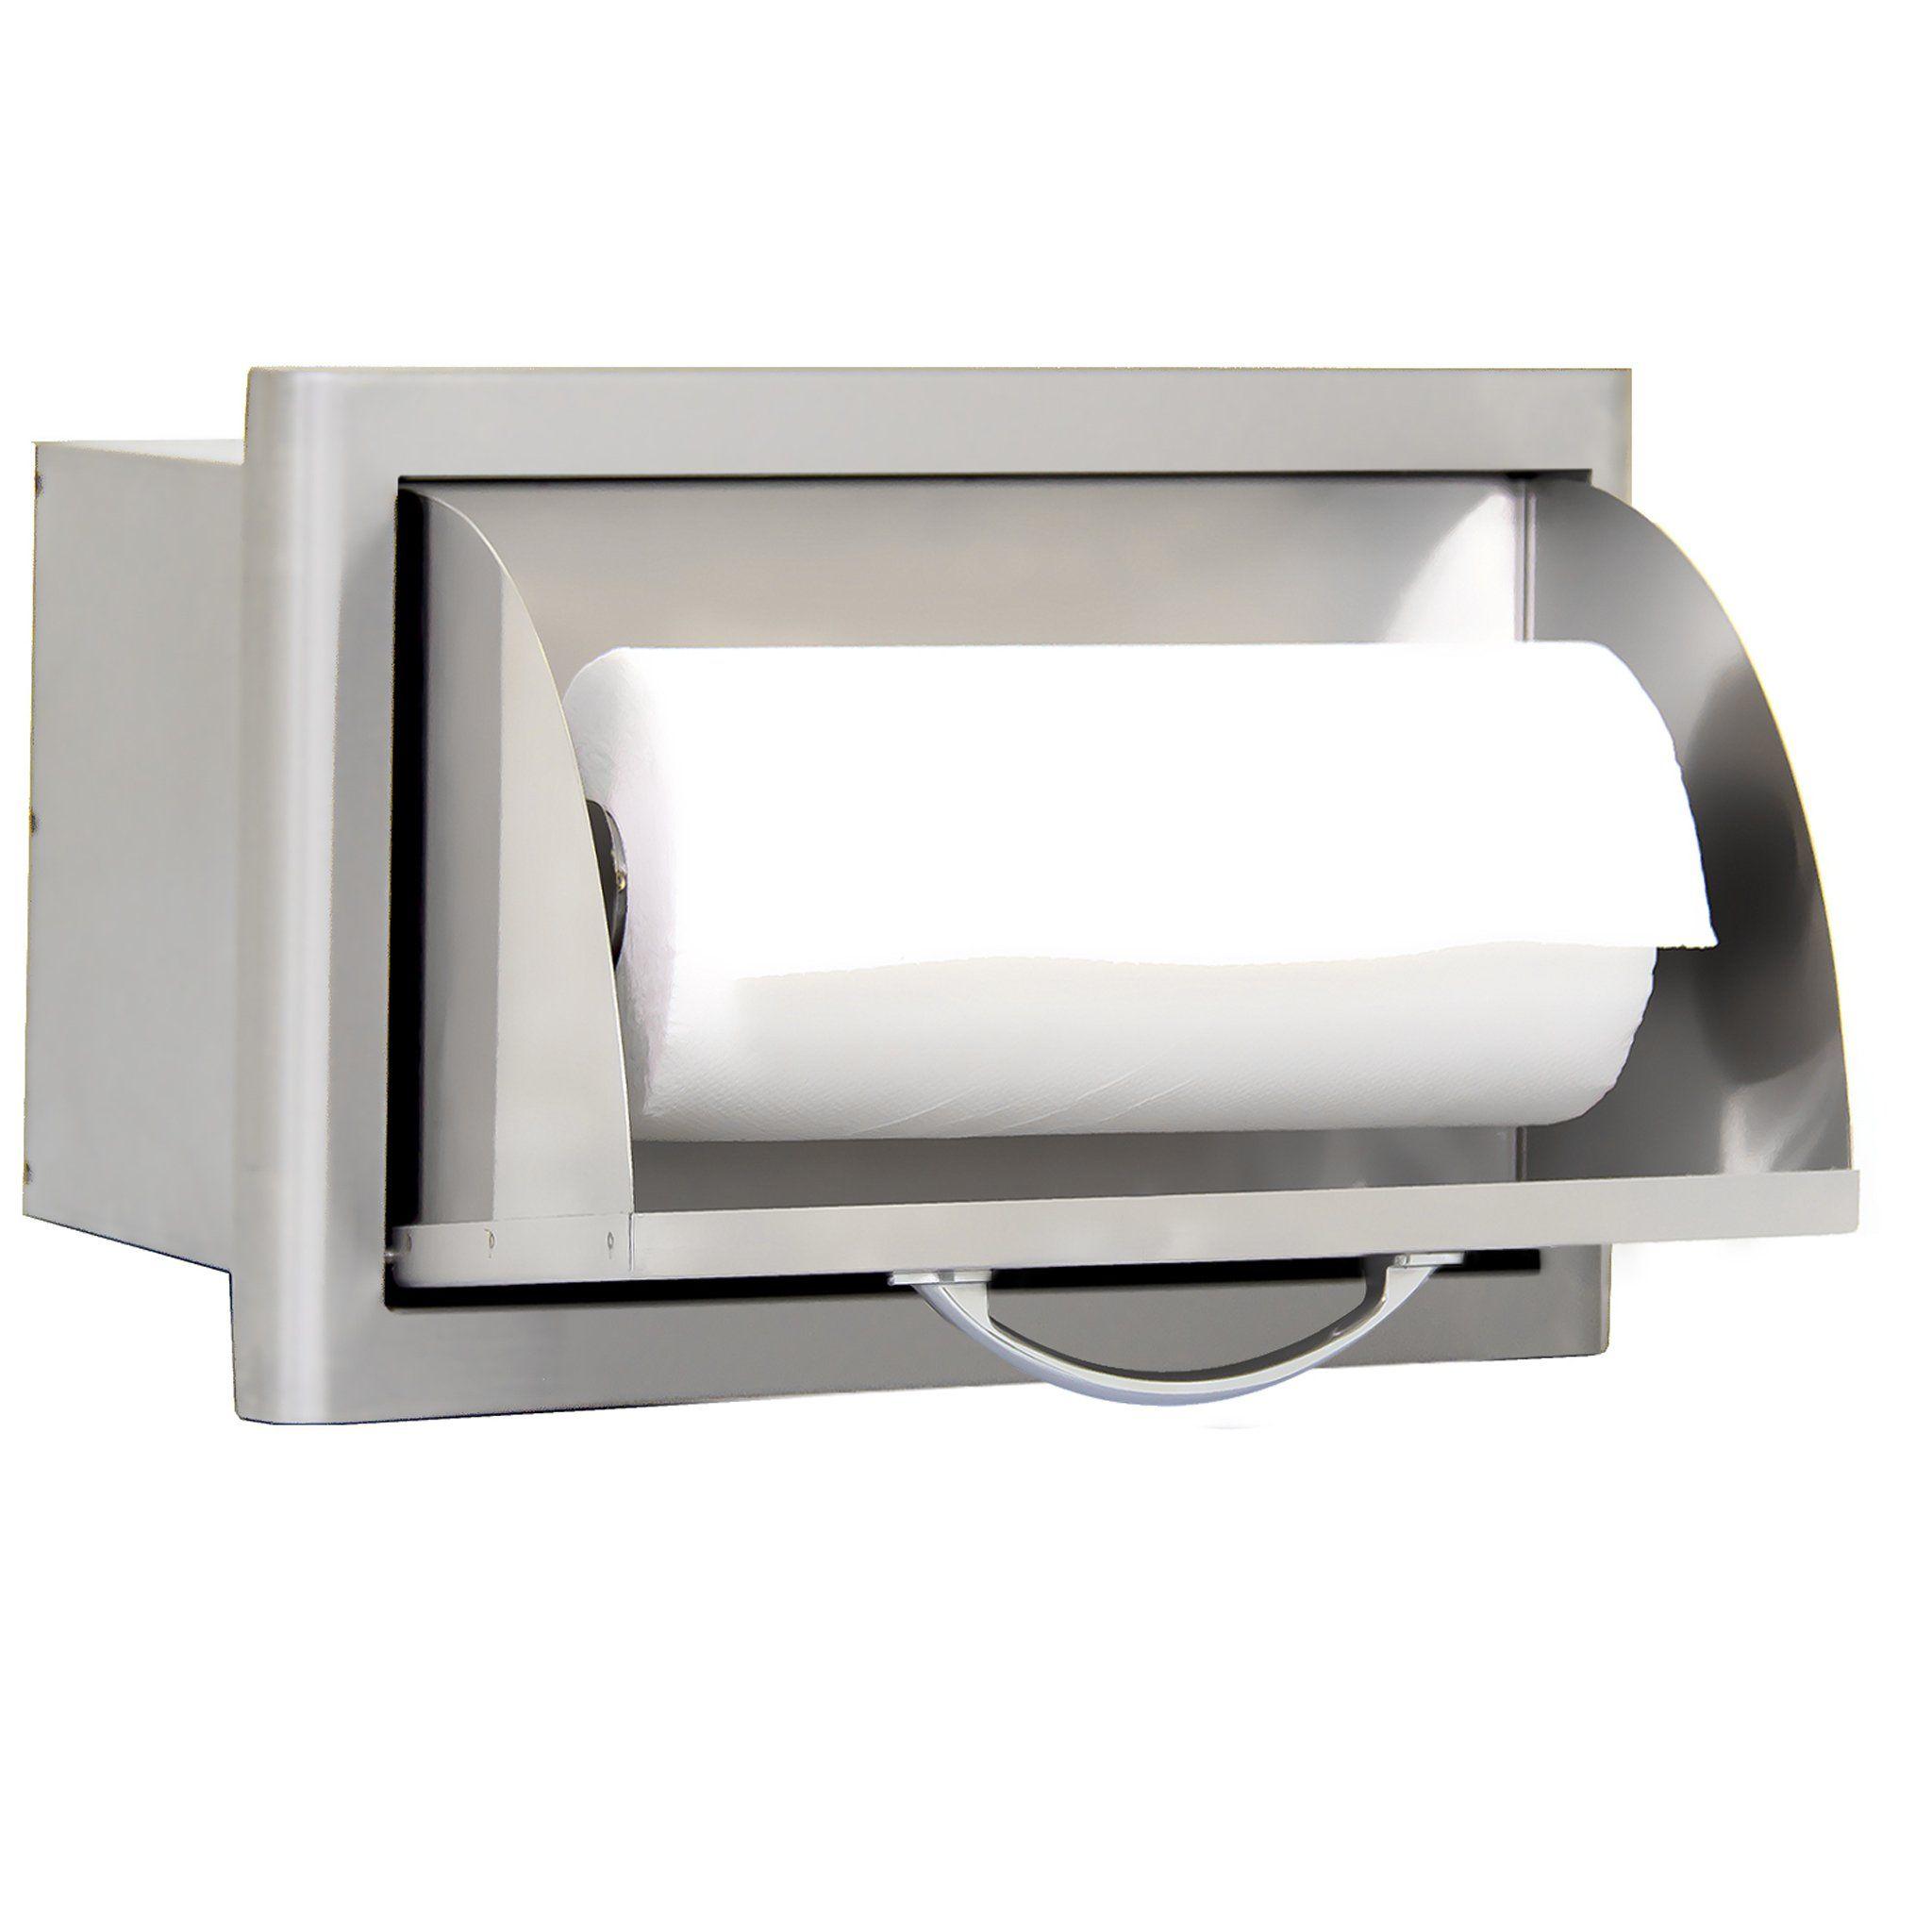 Blaze Paper Towel Holder Paper Towel Storage Paper Towel Holder Kitchen Paper Towel